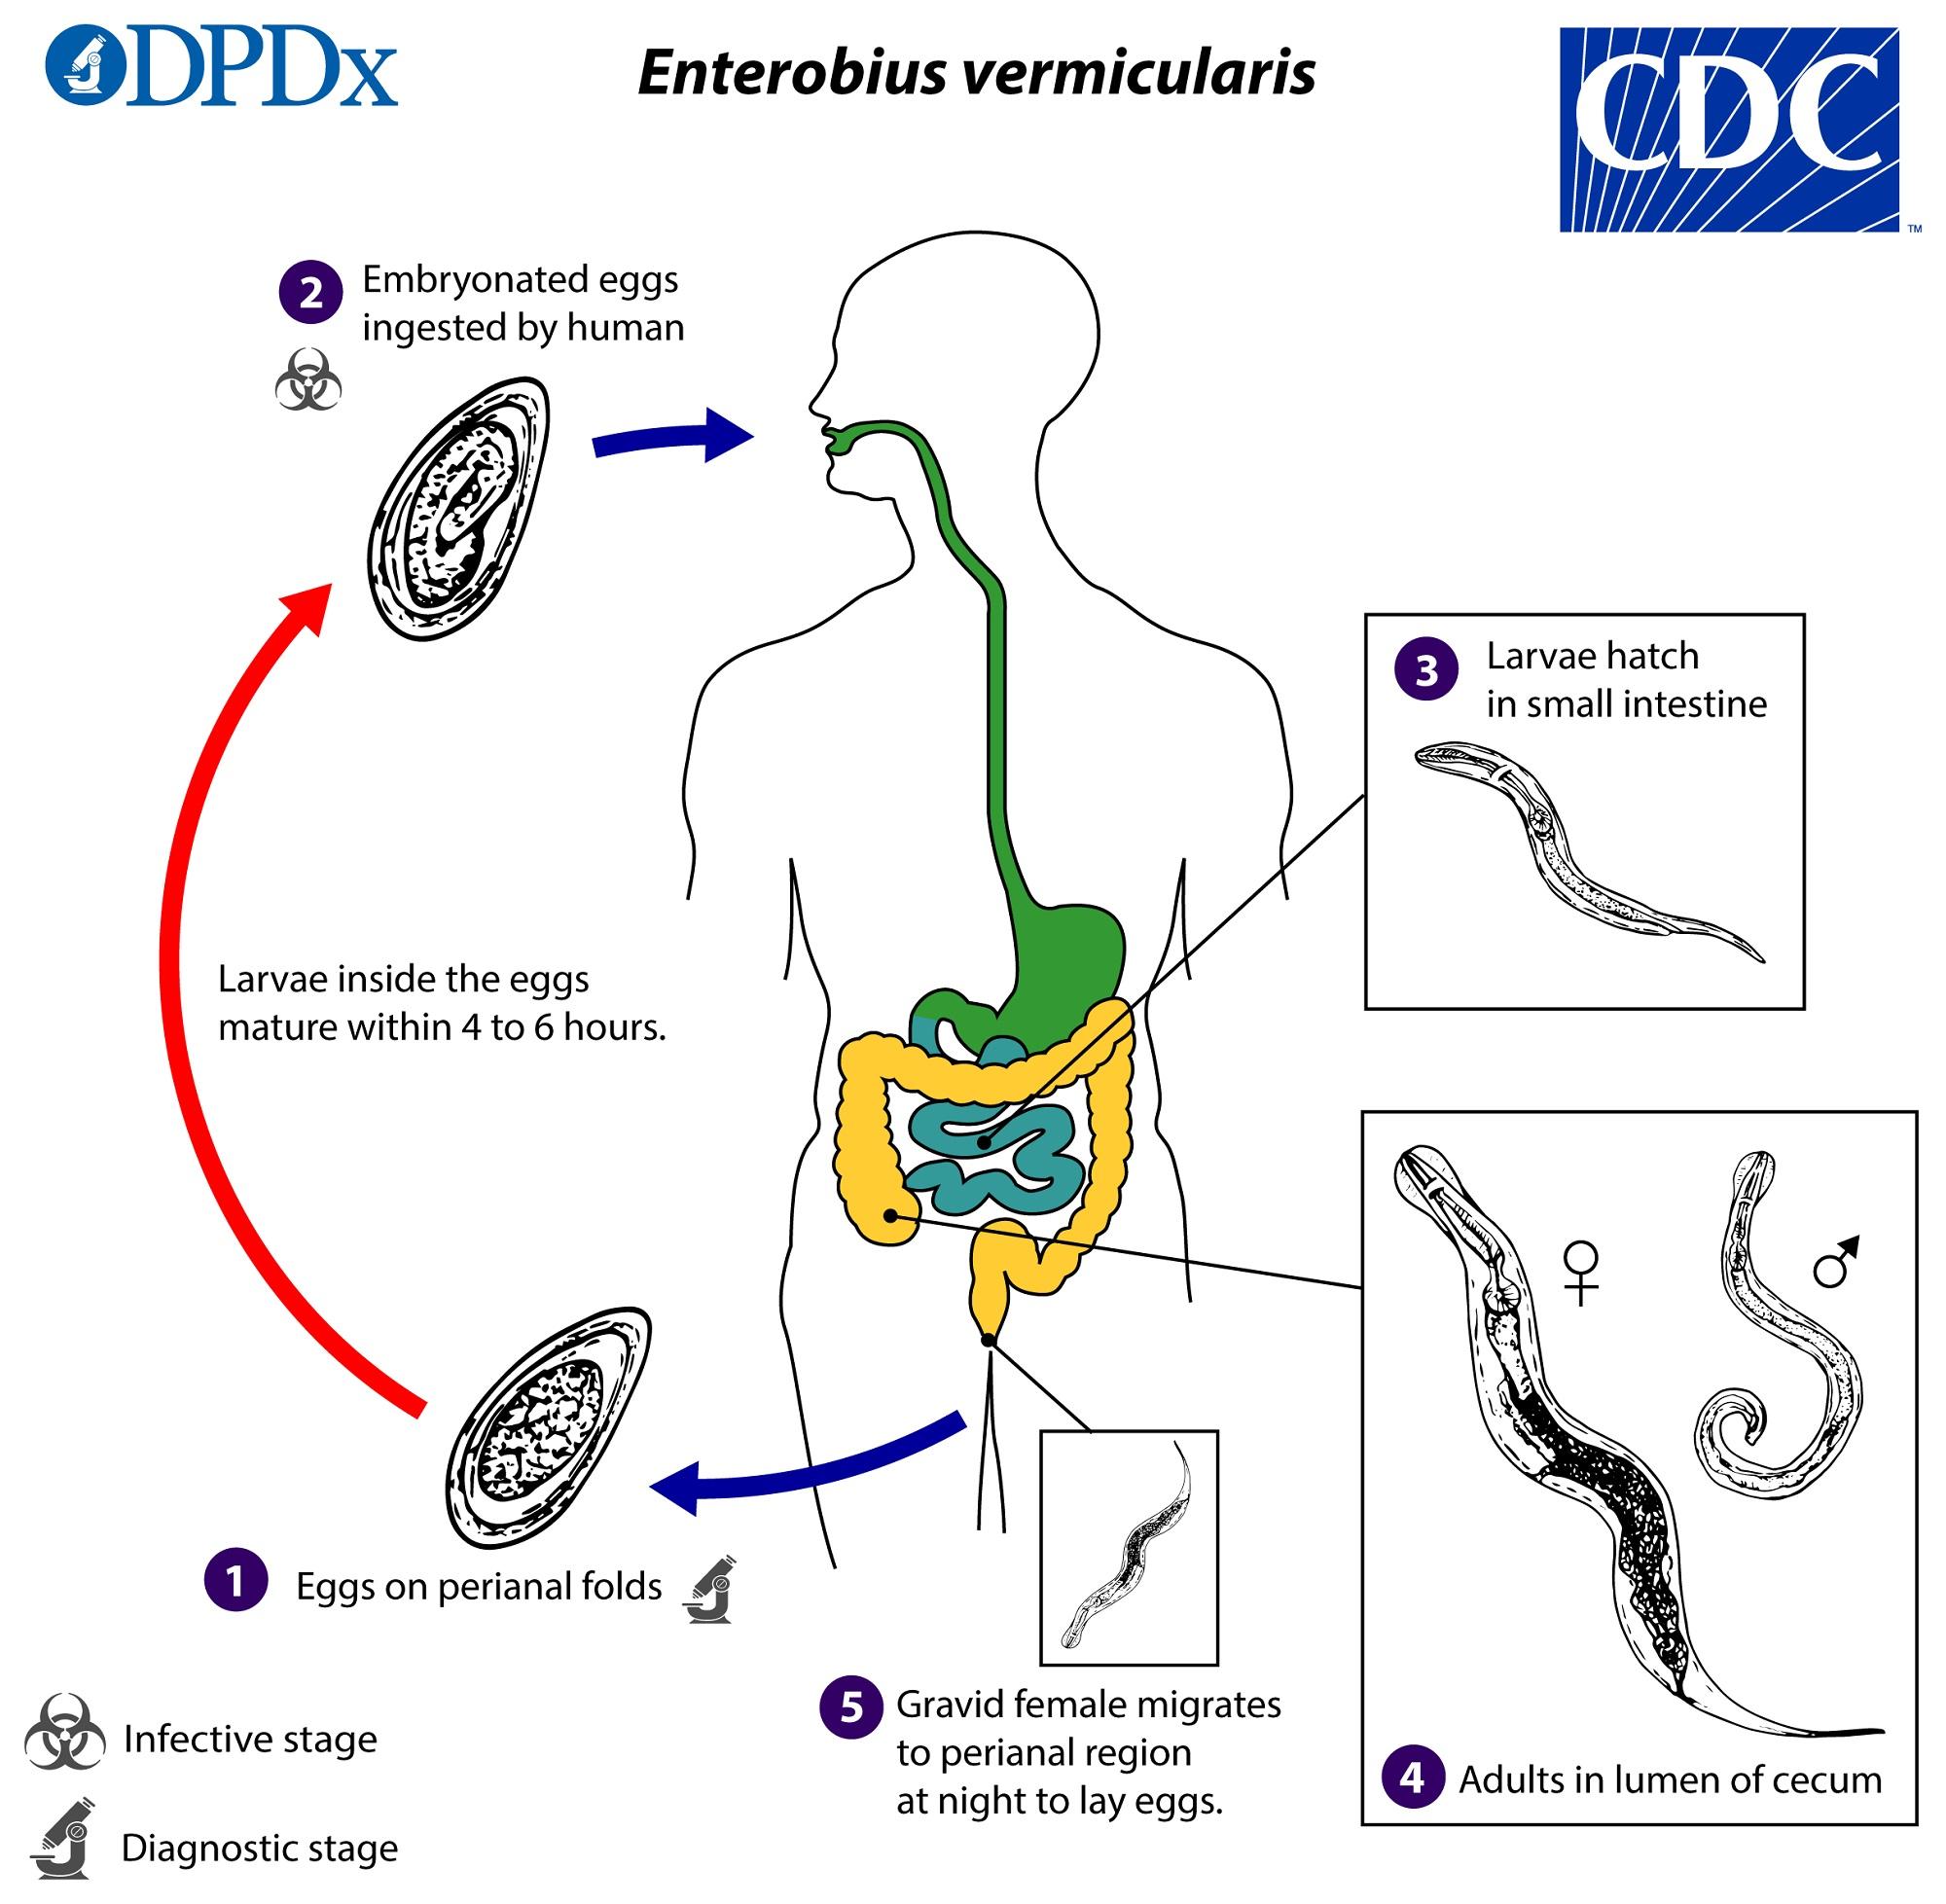 papilloma virus nelluomo diagnosi